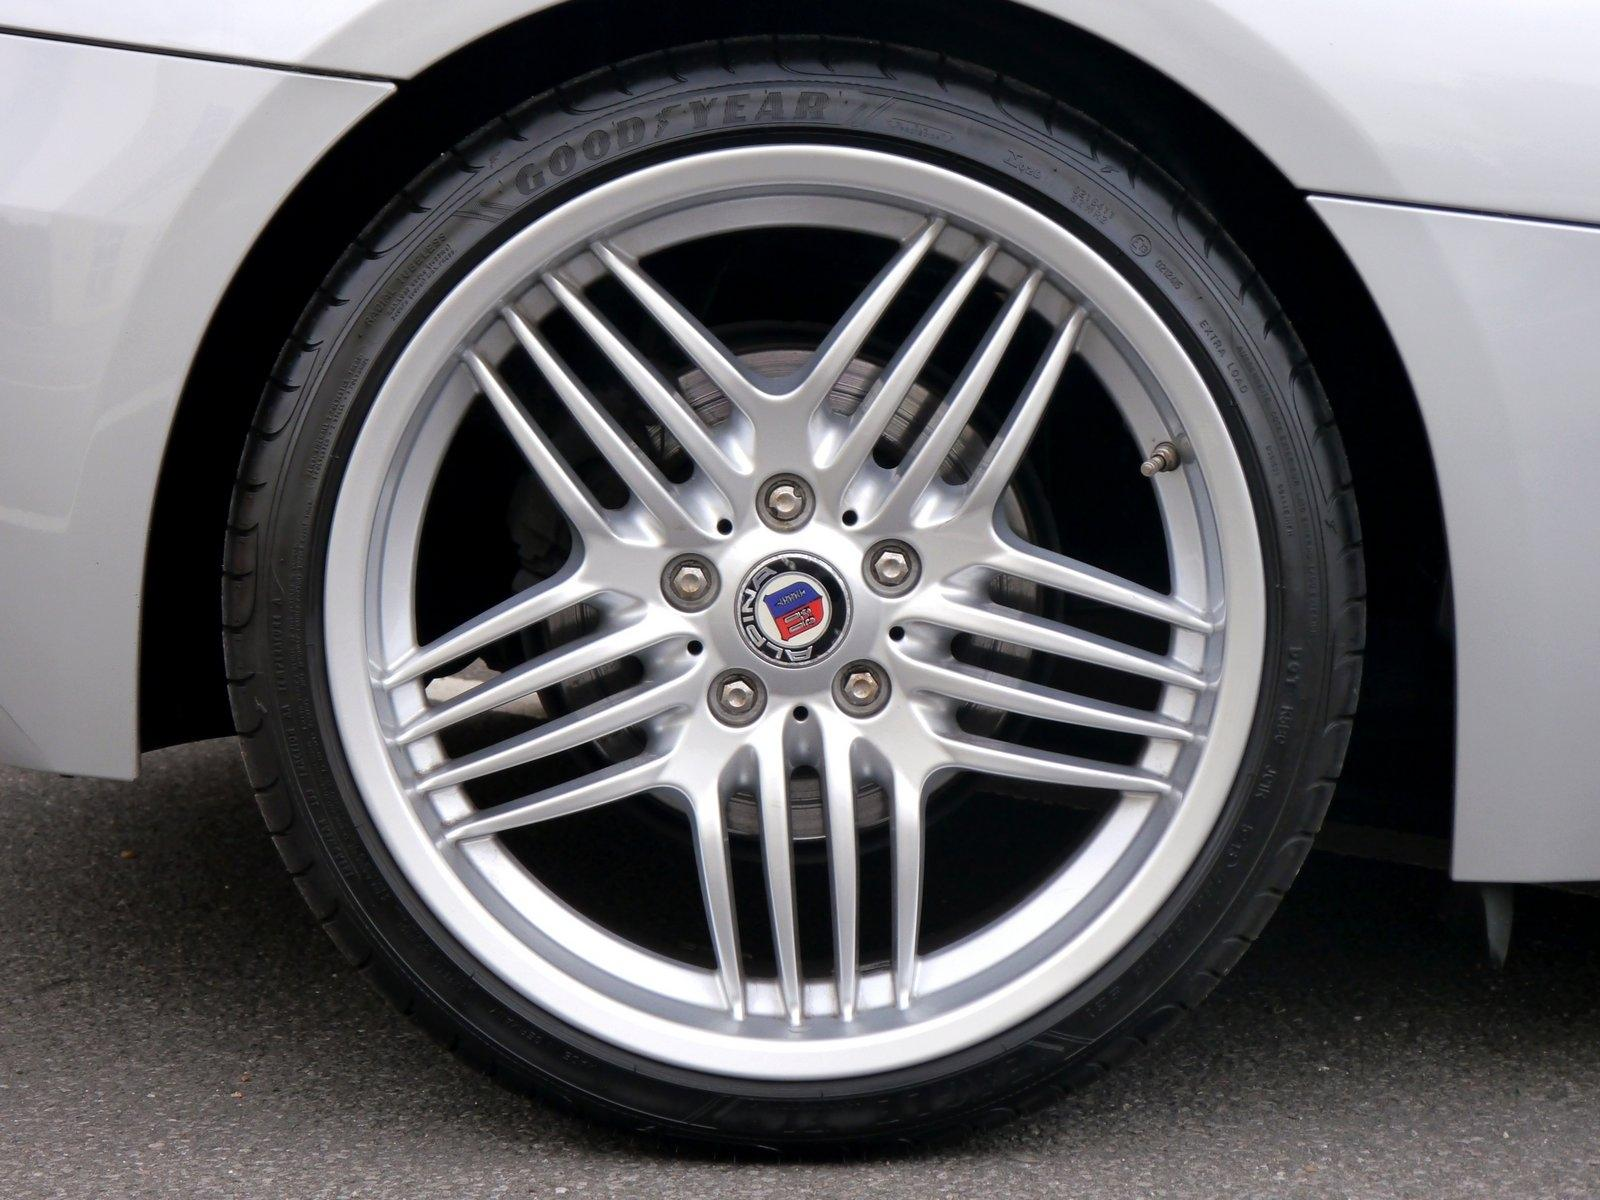 BMWALPINA ROADSTER 3.4 S LUX - RARE VEHICLE - BMW FSH #3